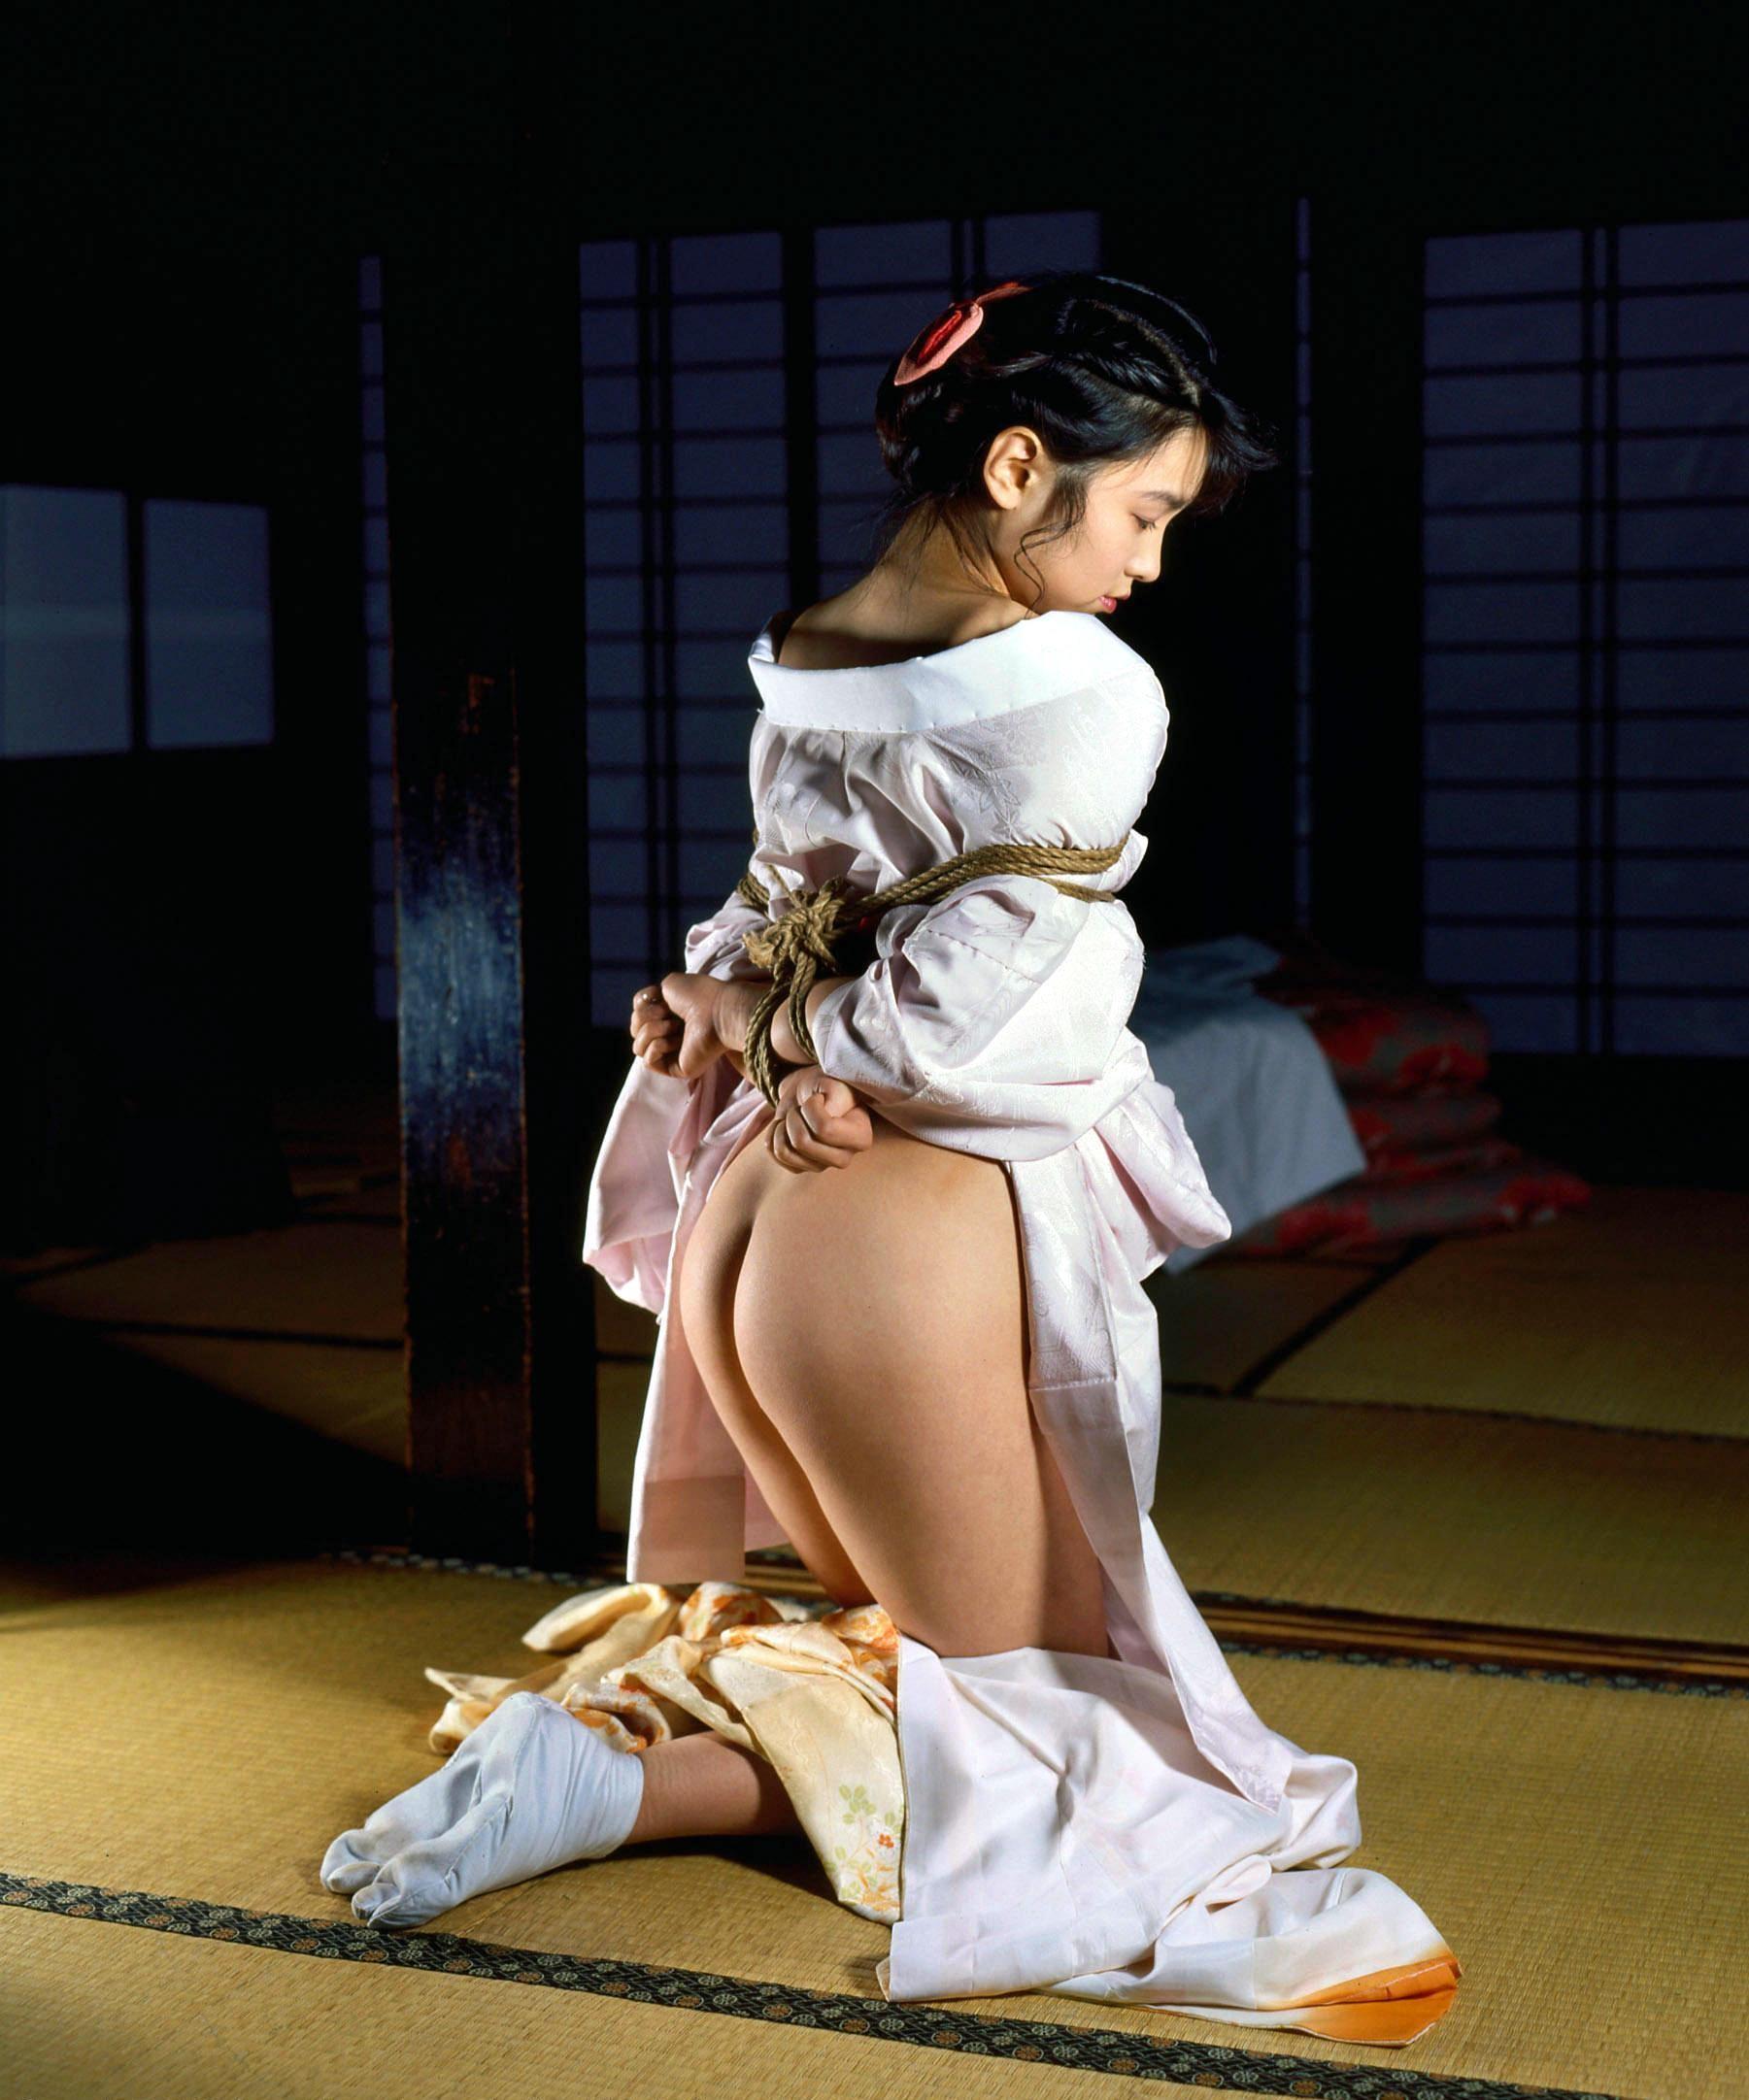 【SMエロ画像】官能的ながらも伝統を感じるw着物には拘束が良く似合う和風SMwww 13